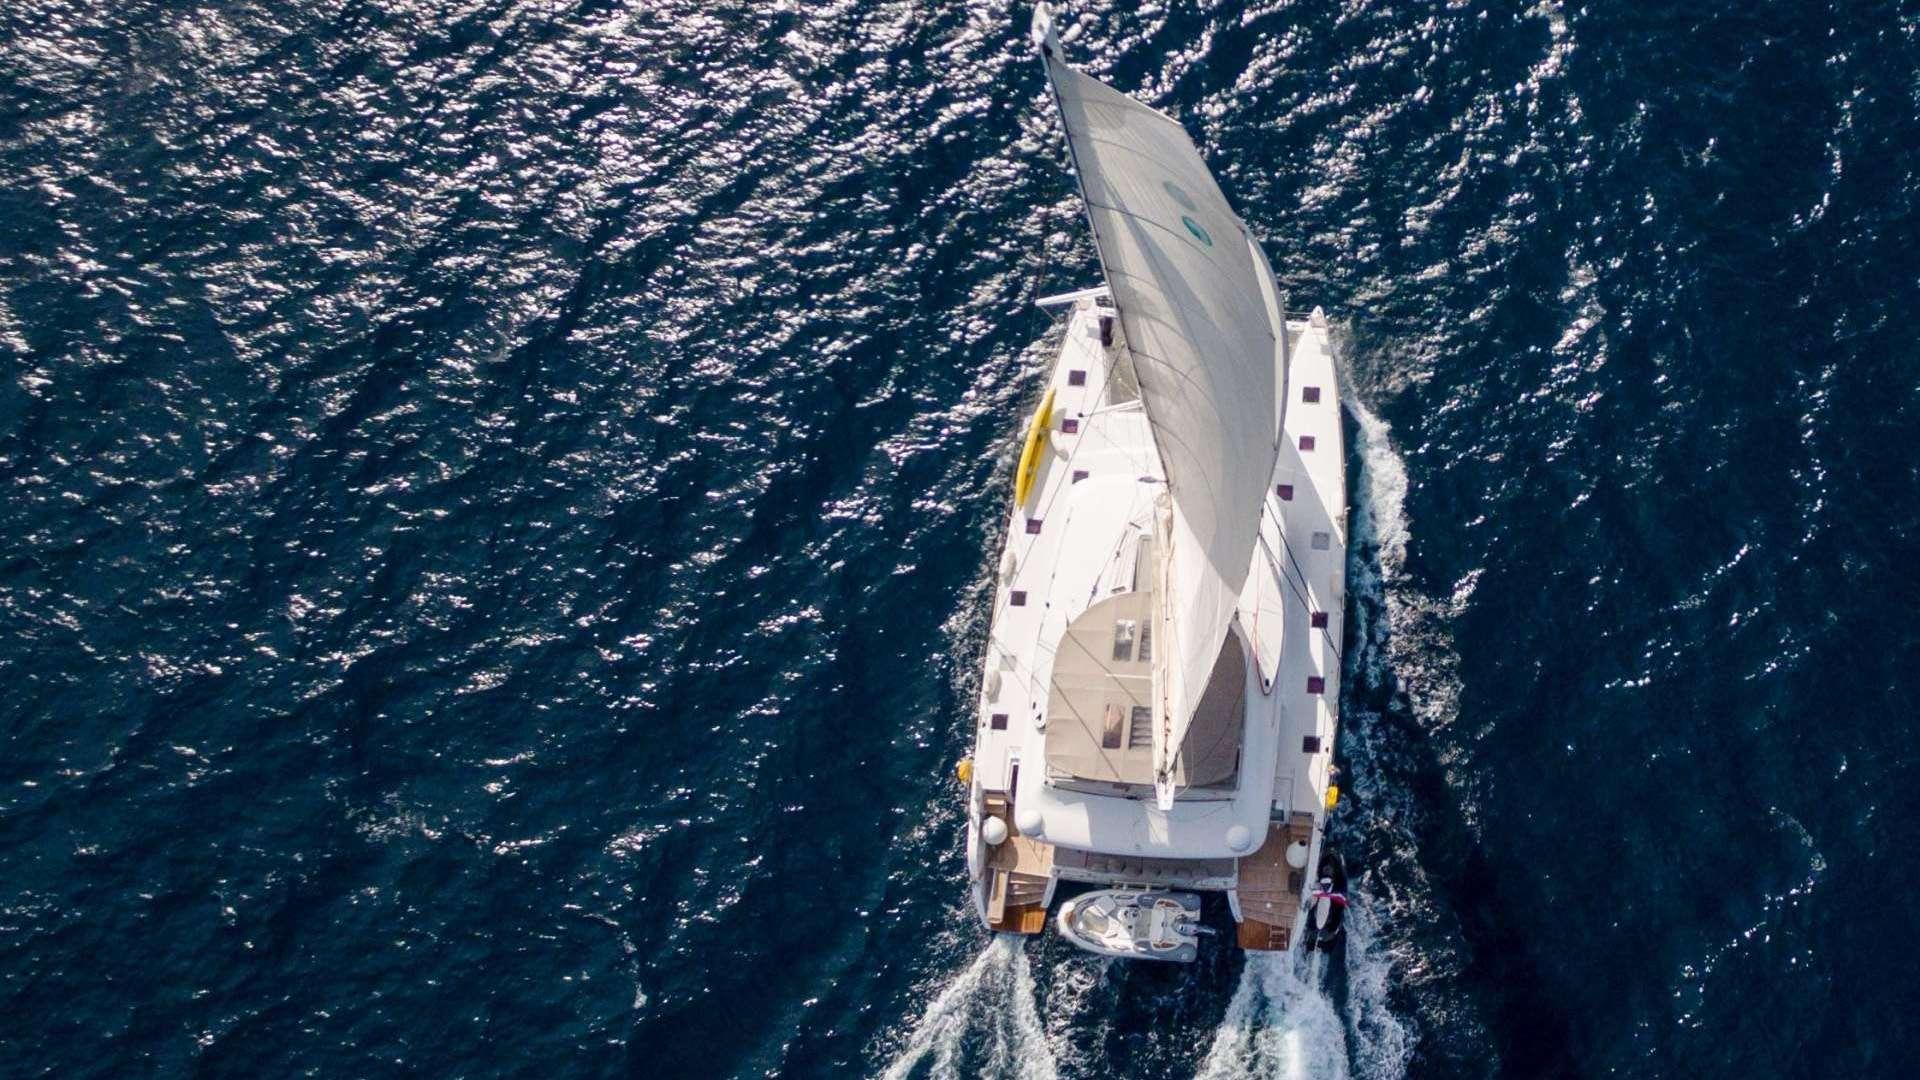 Main image of Bright Moon yacht